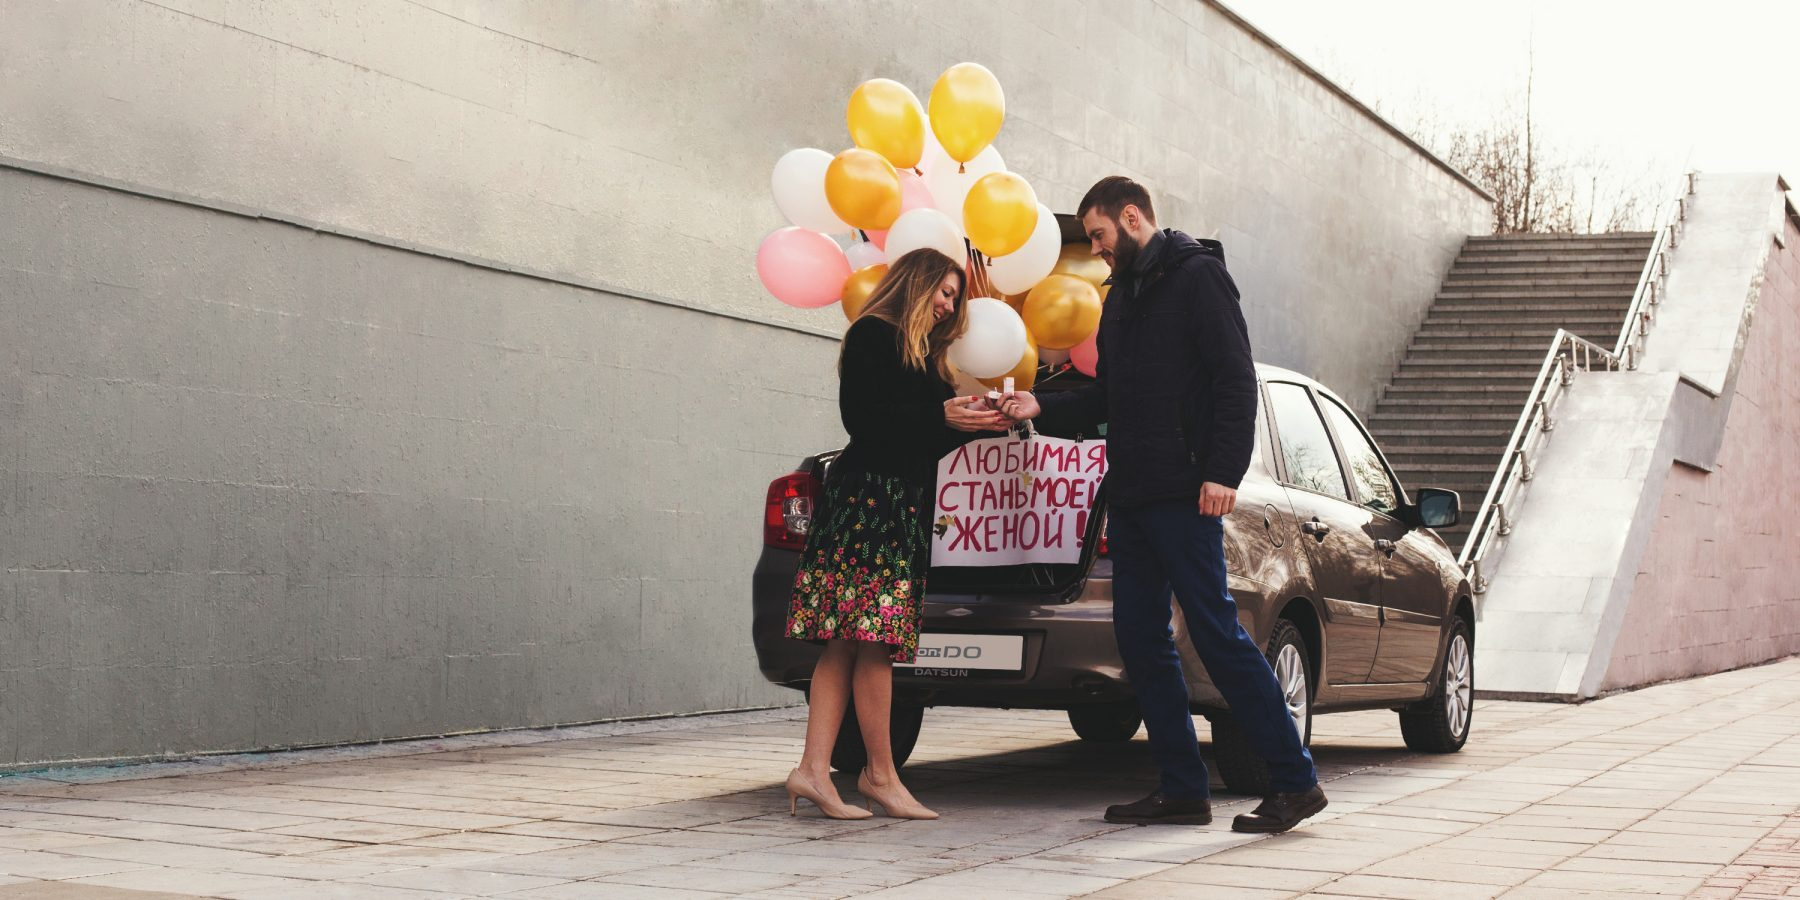 Предложение руки и сердца с автомобилем Datsun.